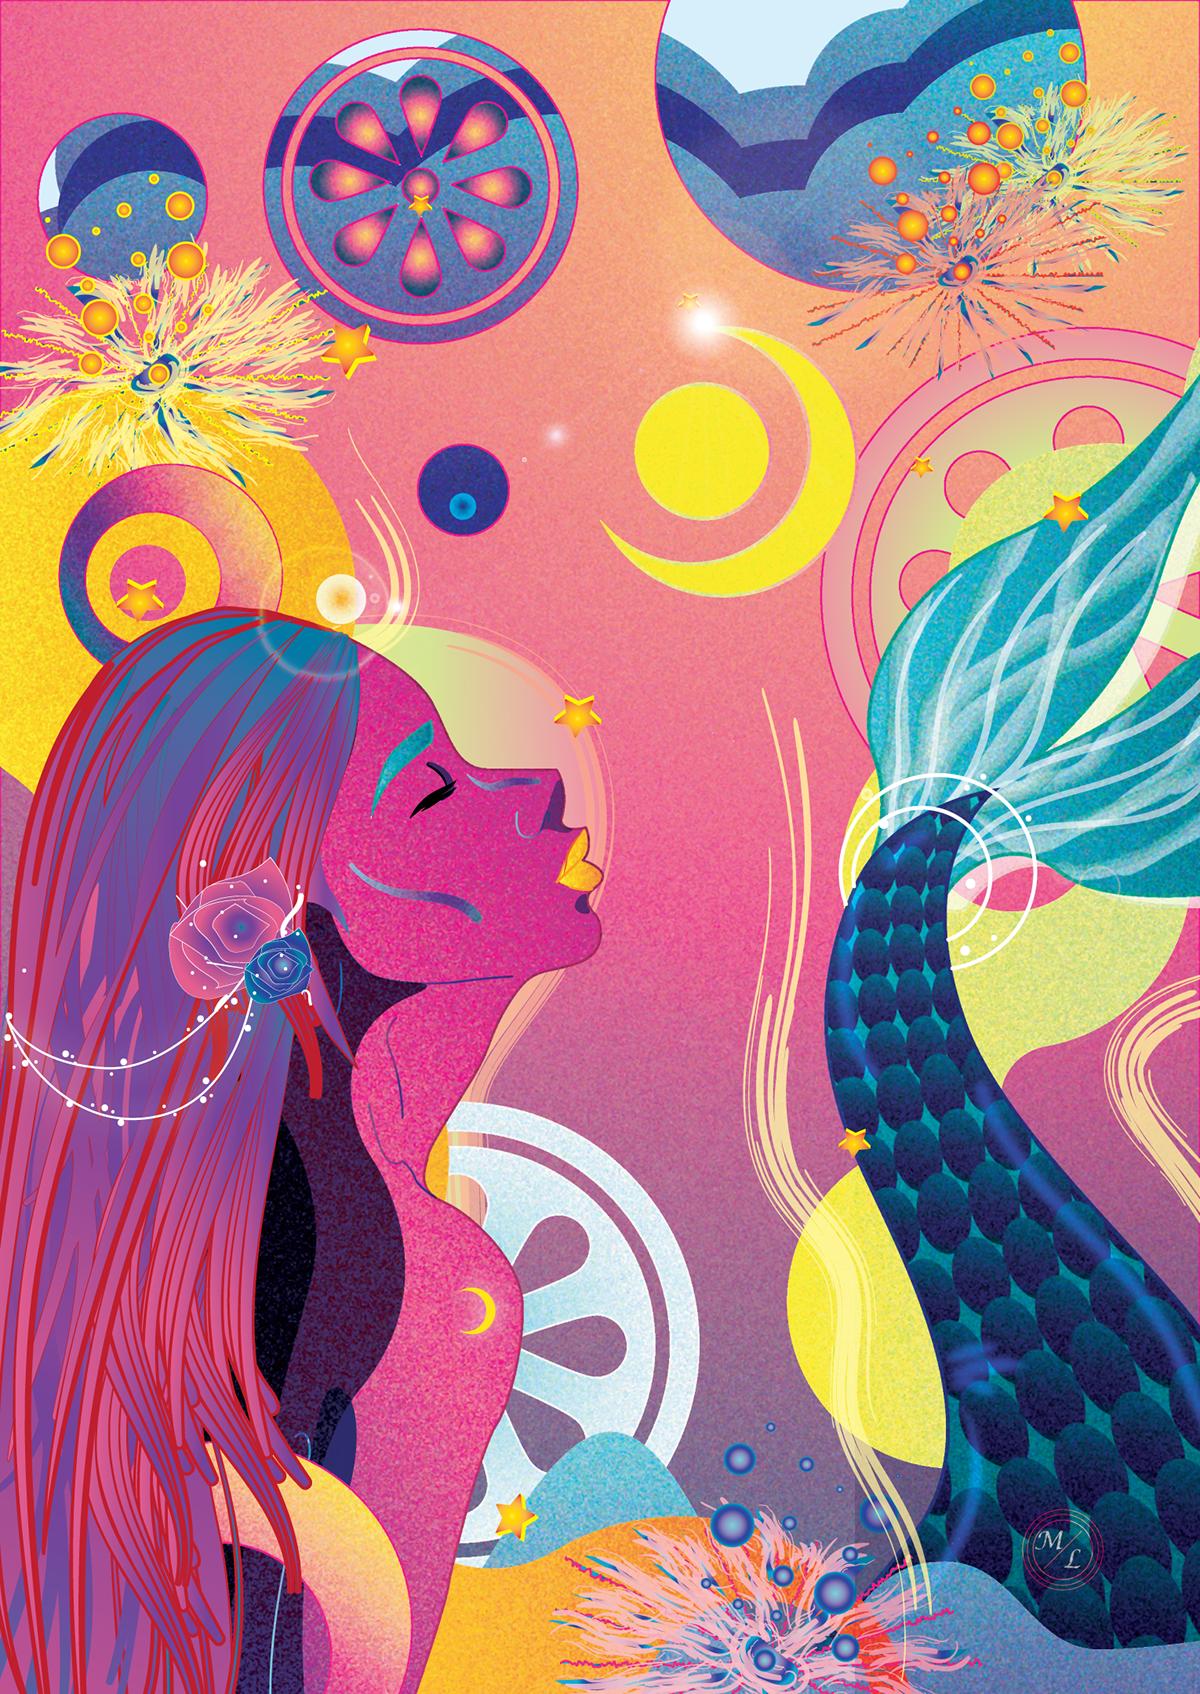 adobeillustrator Graphic Designer MadeWithAI mermaidart mermaid luna sea color ILLUSTRATION